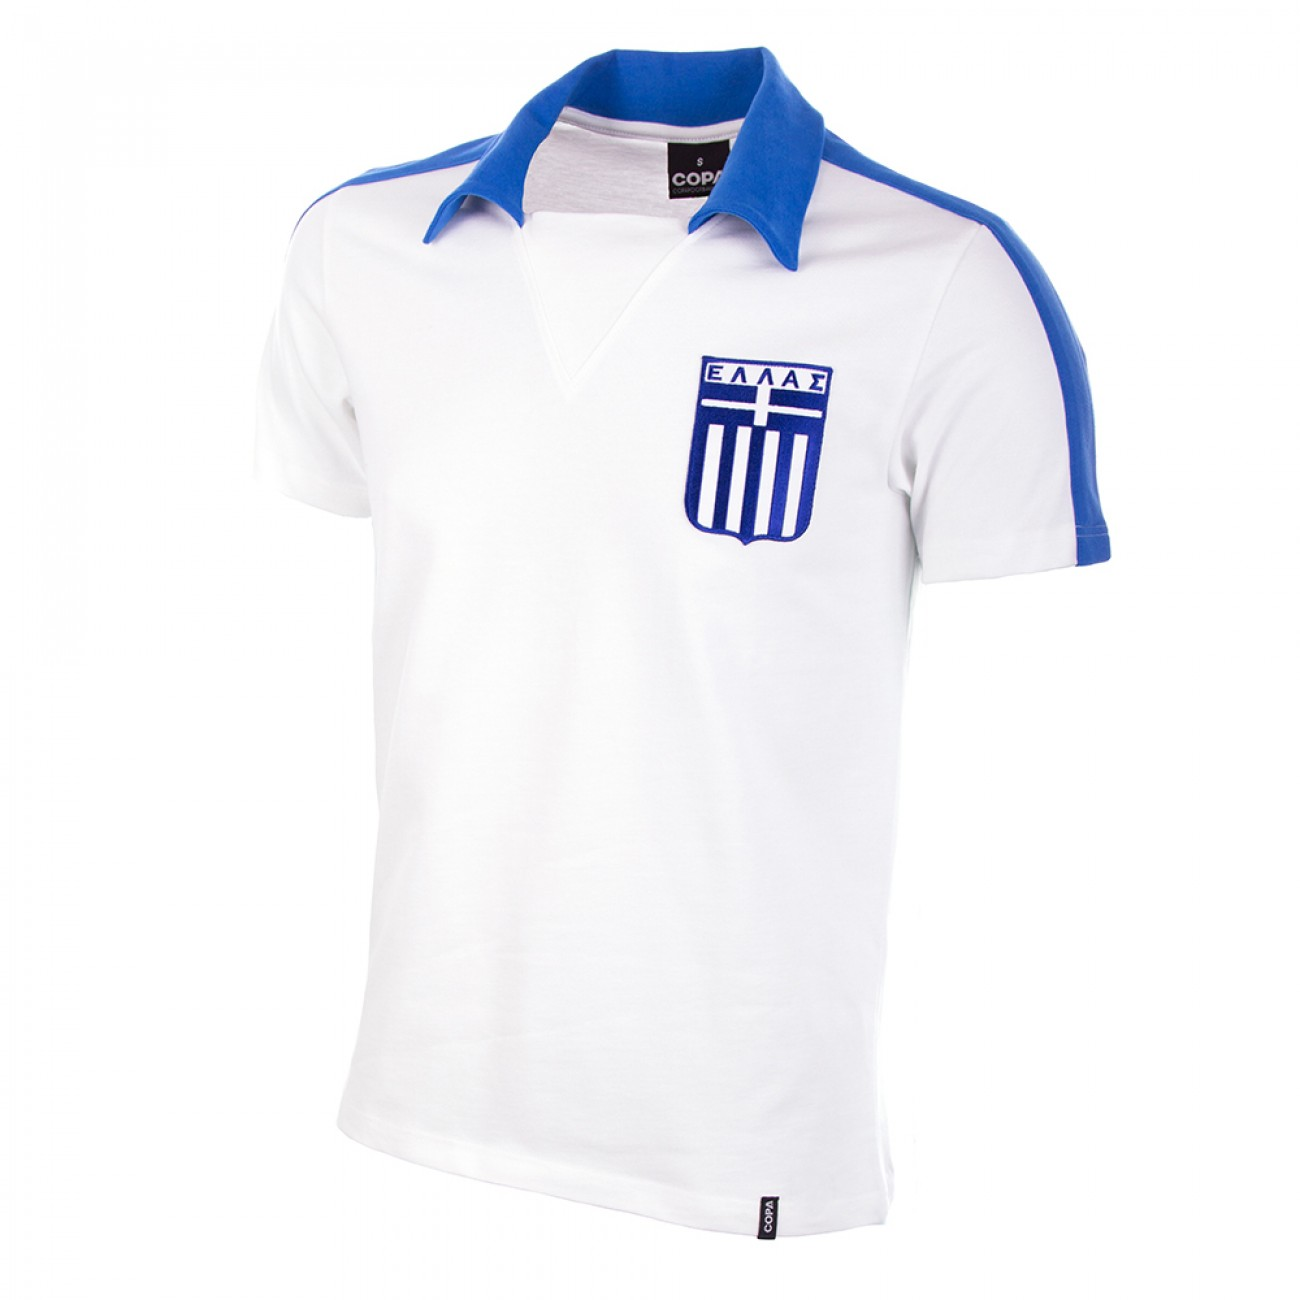 http://www.retrofootball.es/ropa-de-futbol/camiseta-grecia-a-os-80.html